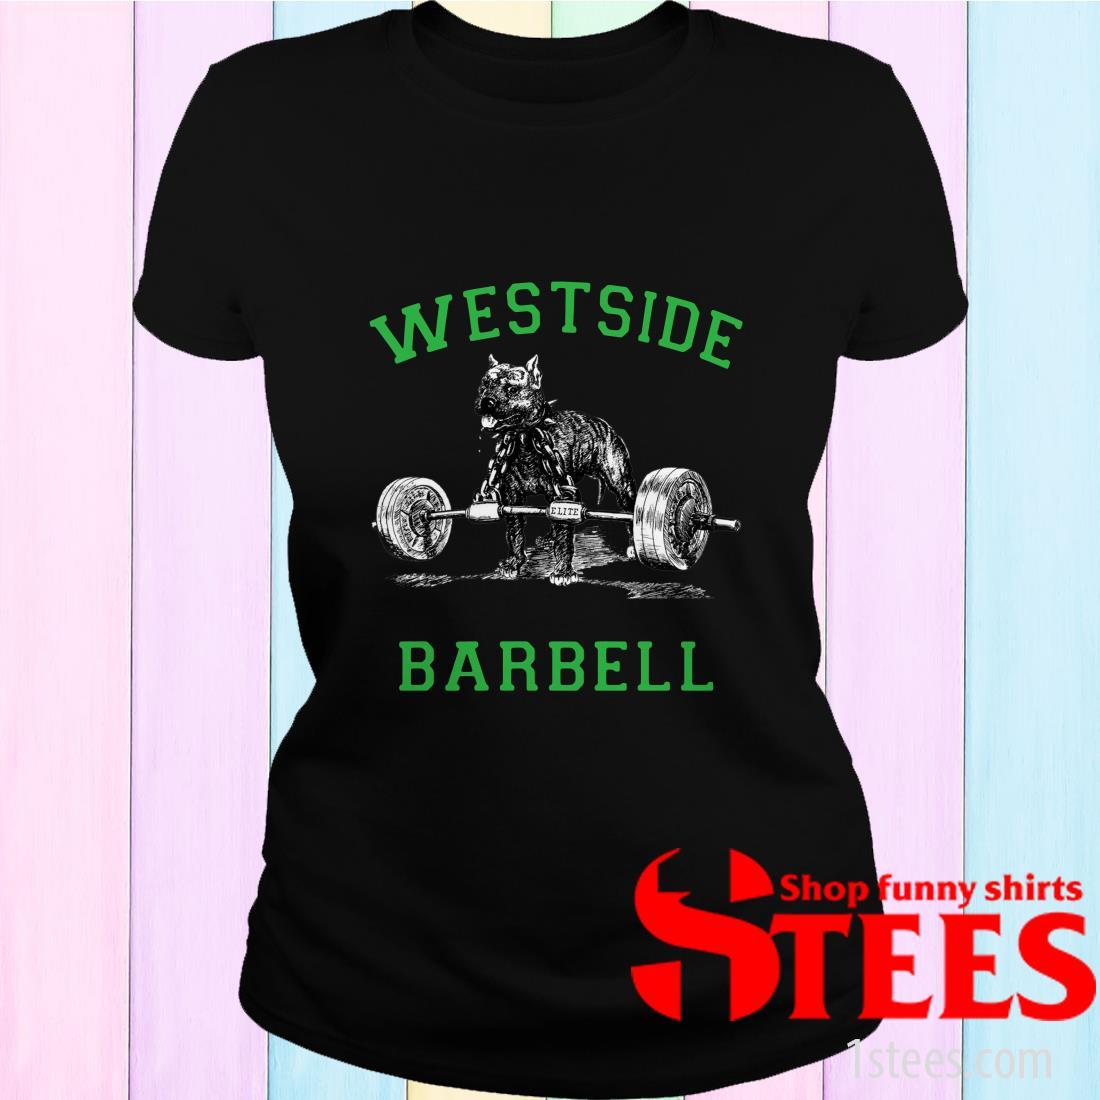 Westside Barbell Women's T-shirt